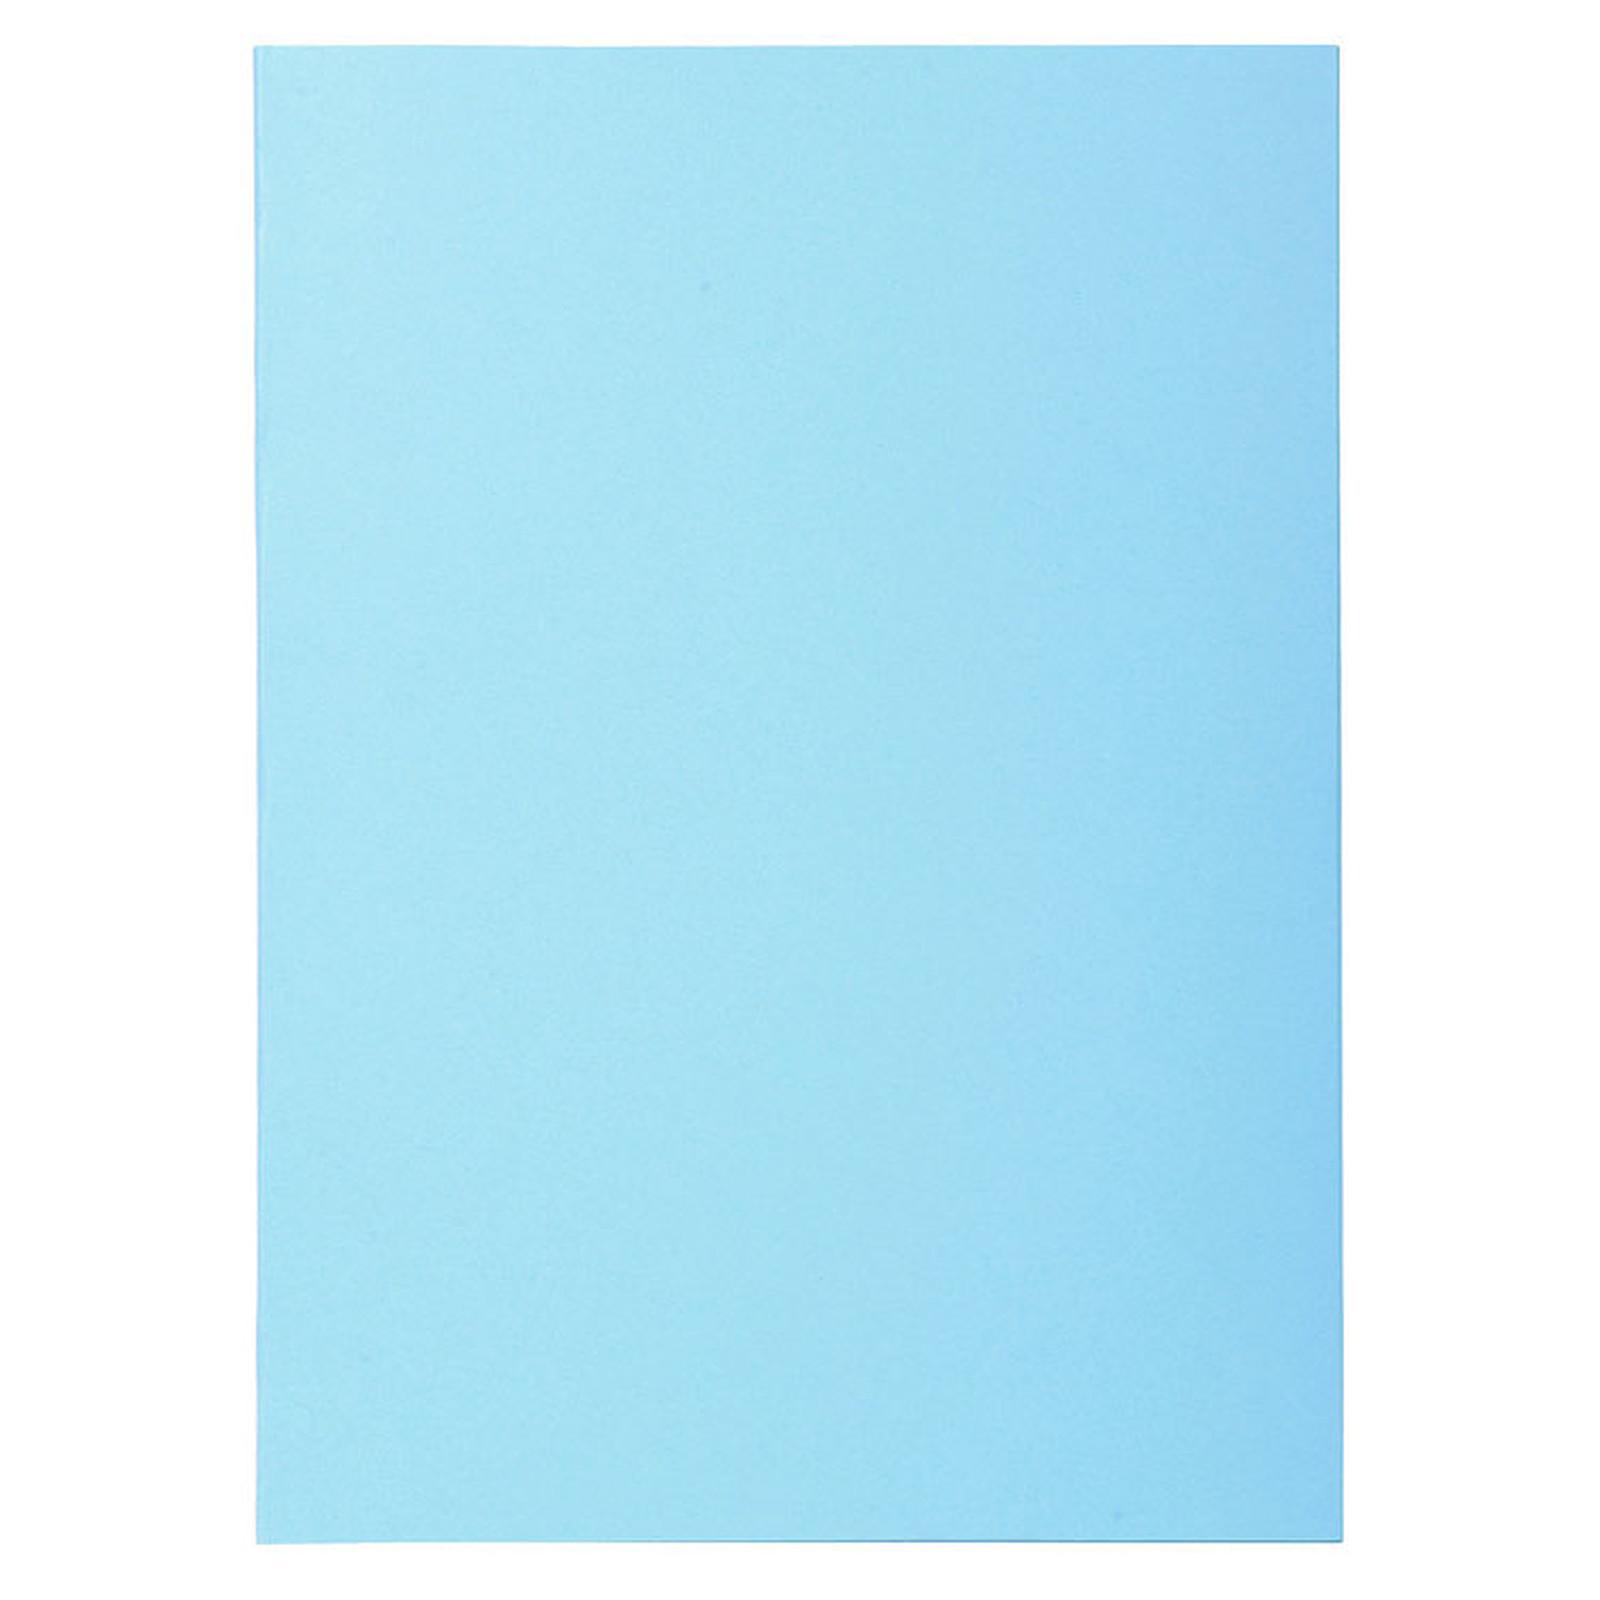 Exacompta Sous chemises Super 60 Bleu clair x 100